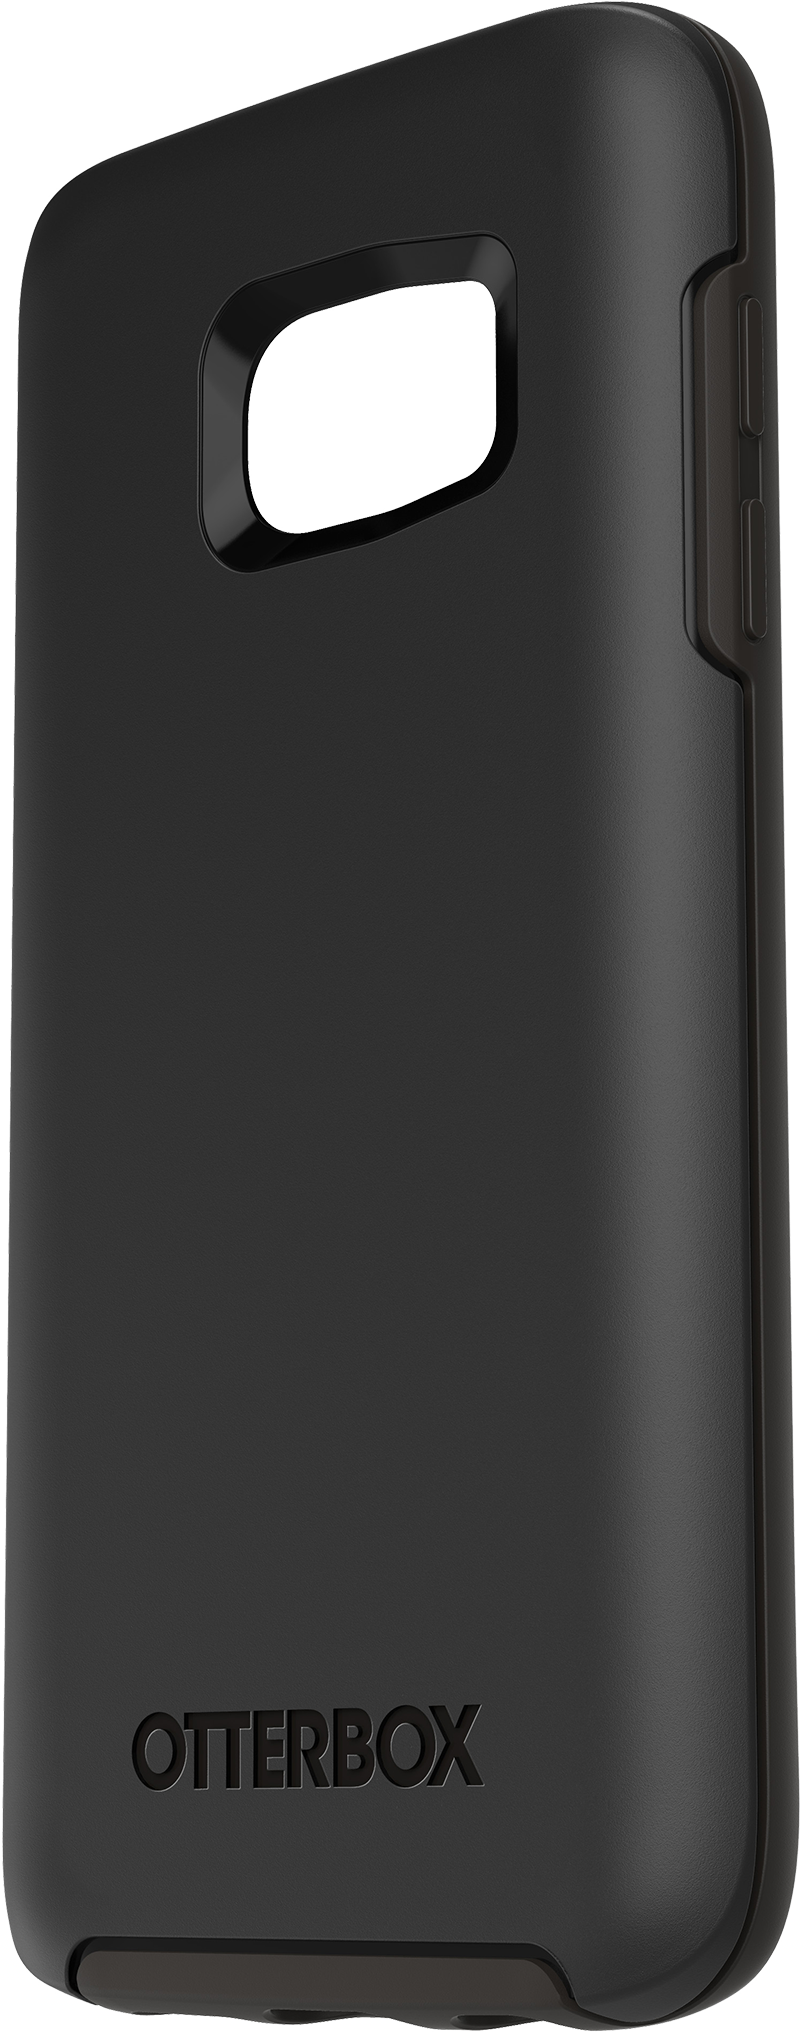 Coque Otterbox Symmetry Galaxy S7 noire